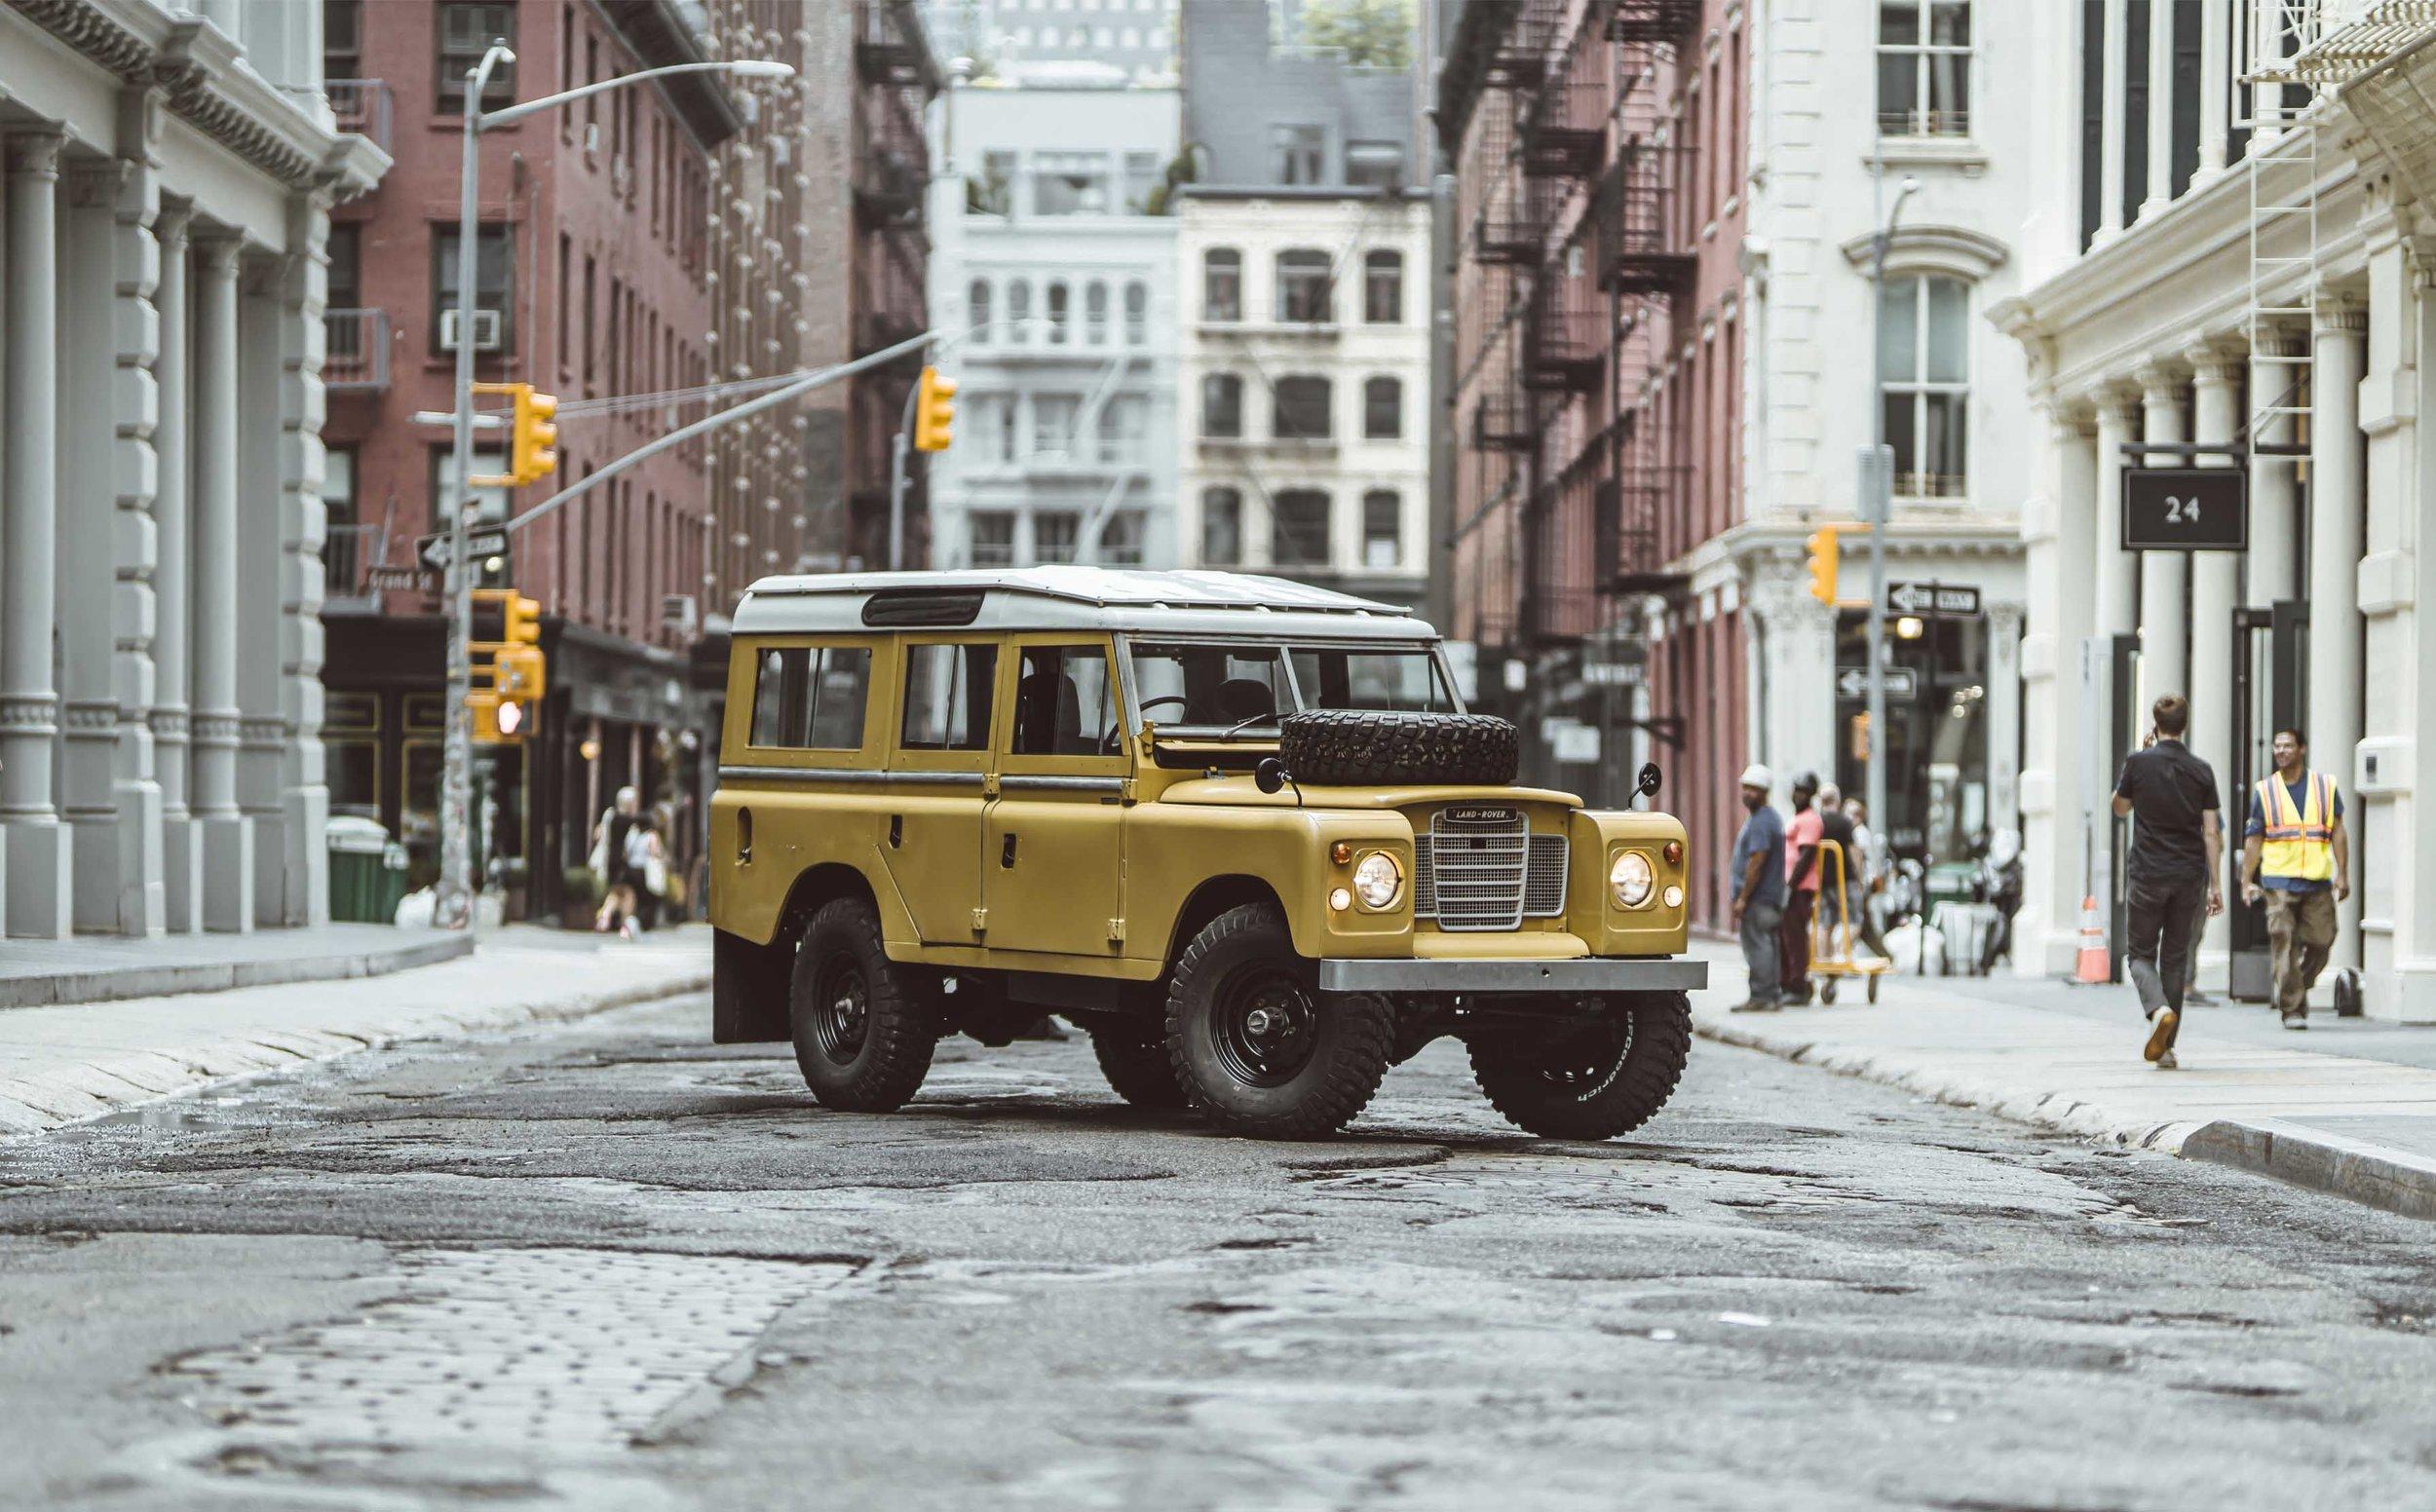 1975_Land_Rover_Series_III_109_Bahama_Gold_Large_0004_Layer 27.jpg